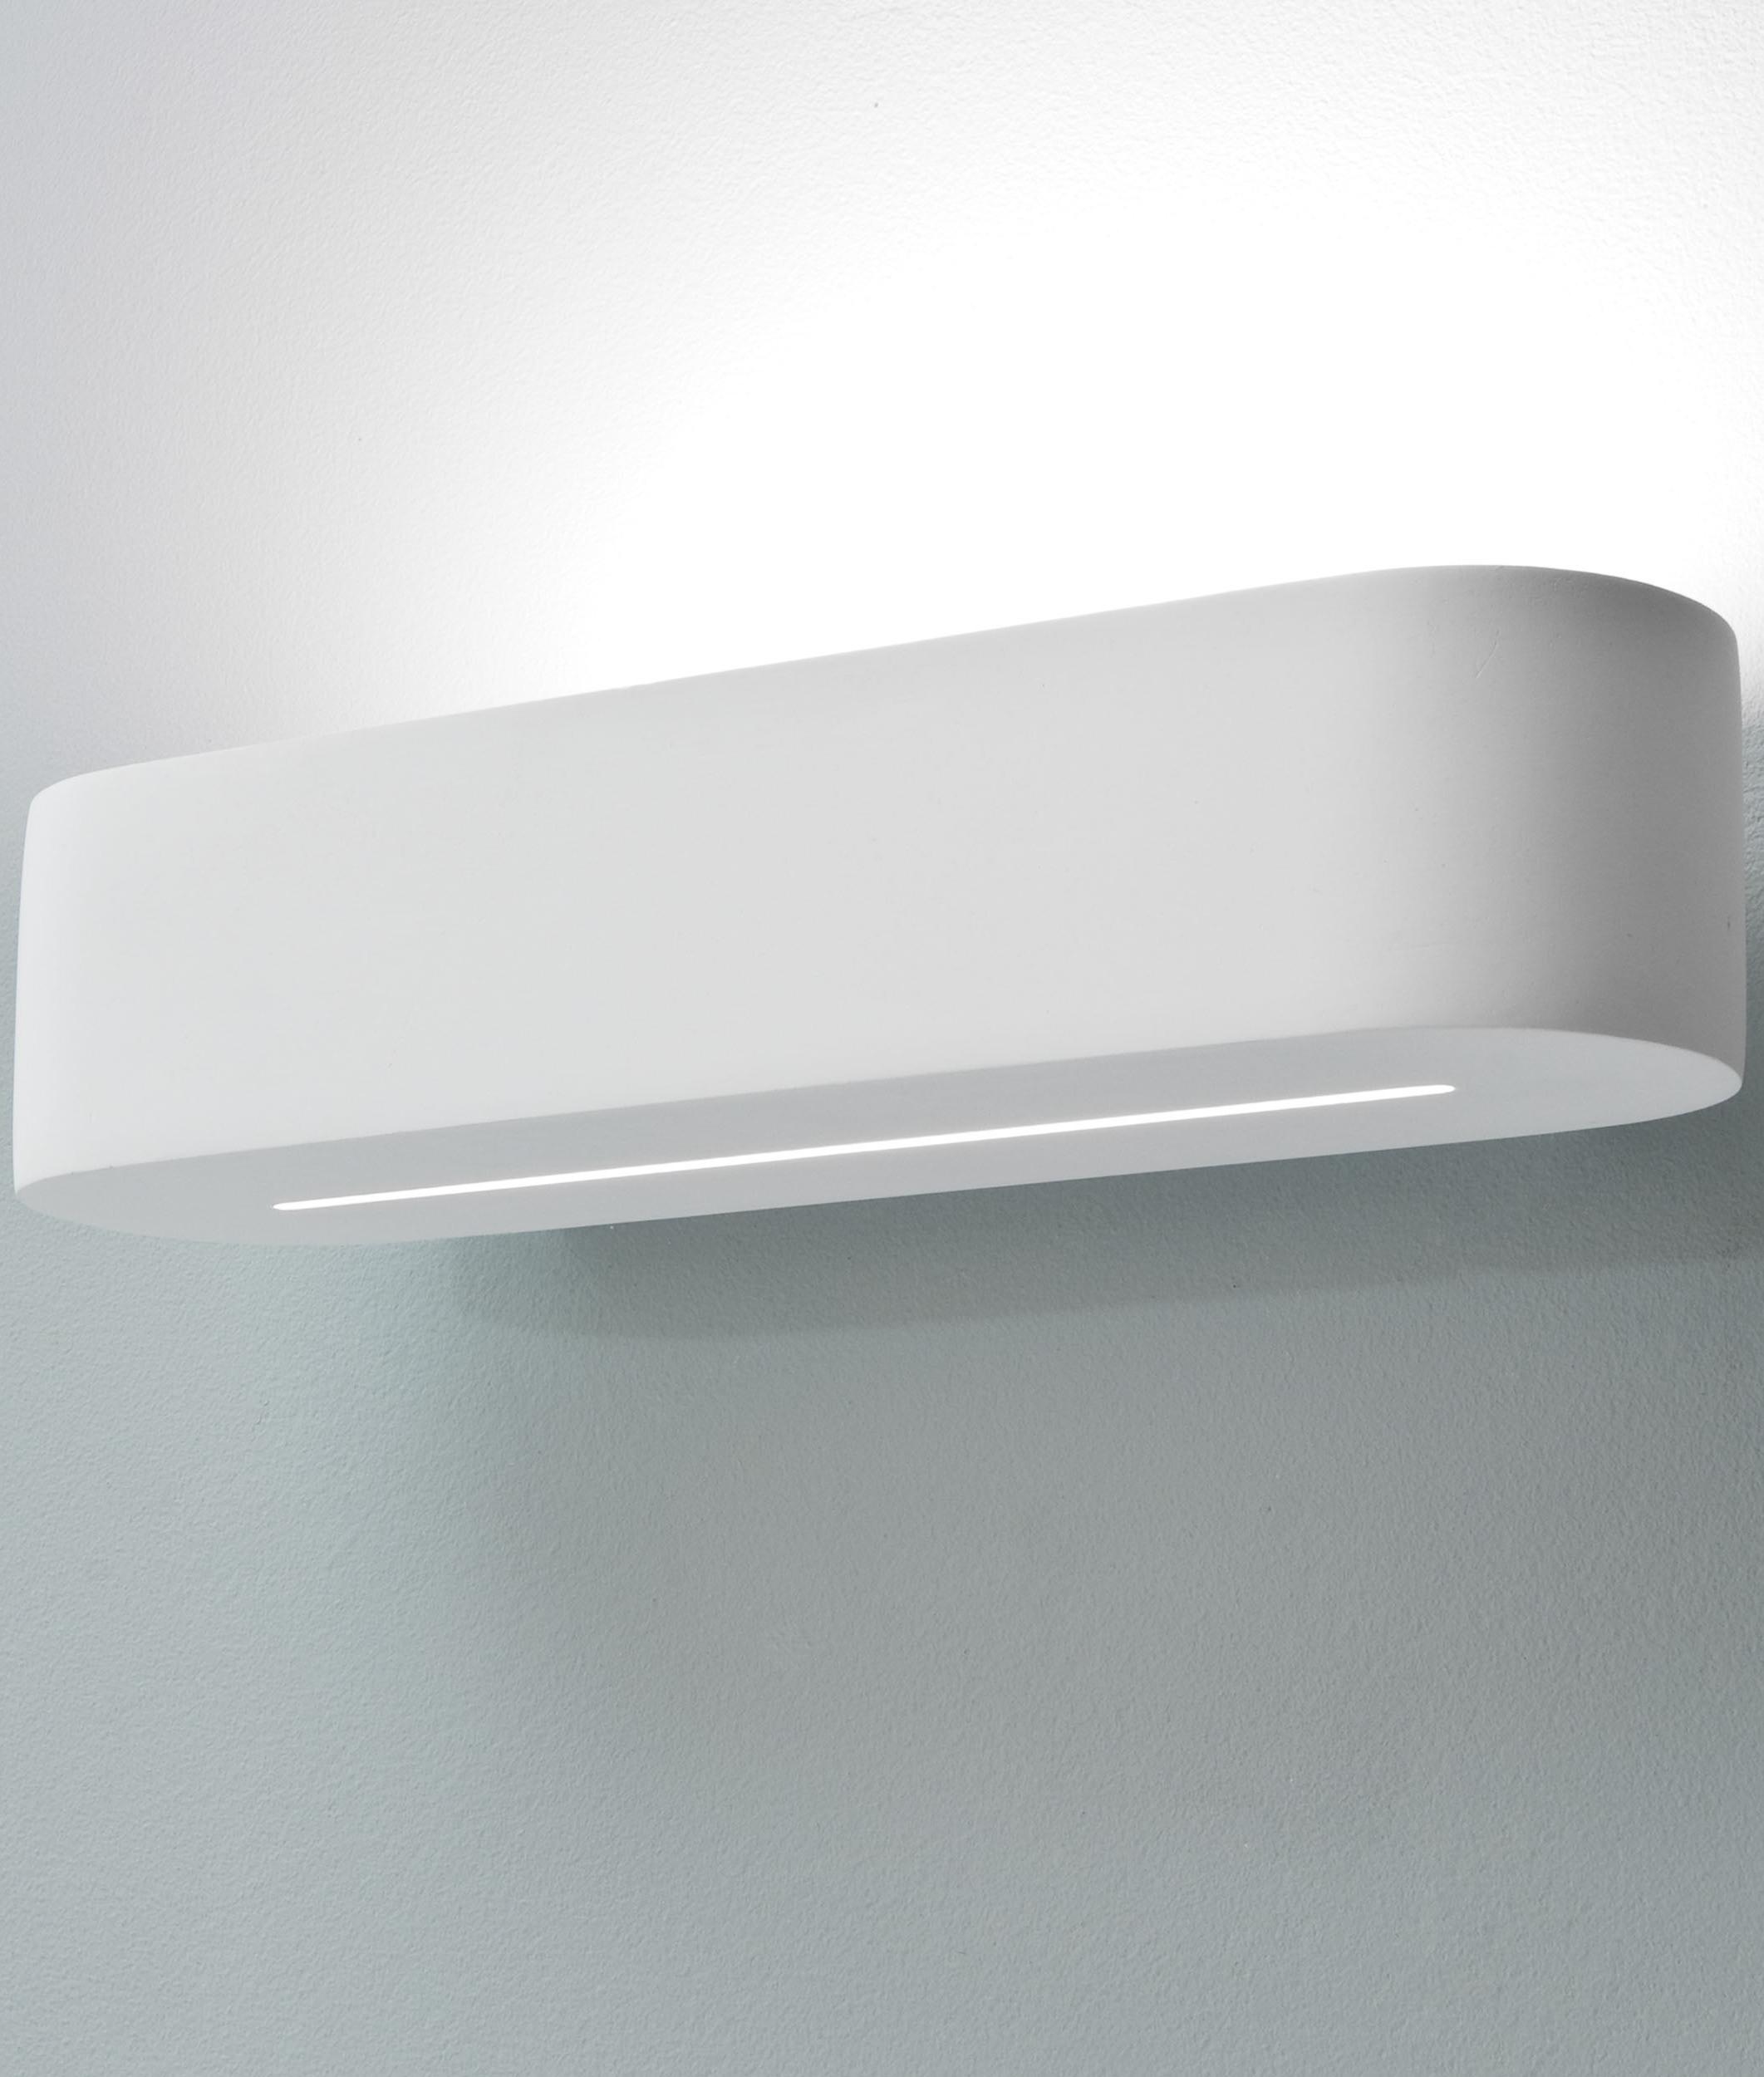 Small Solar Wall Lights : Pinslot Low Energy Uplight - Small 300mm